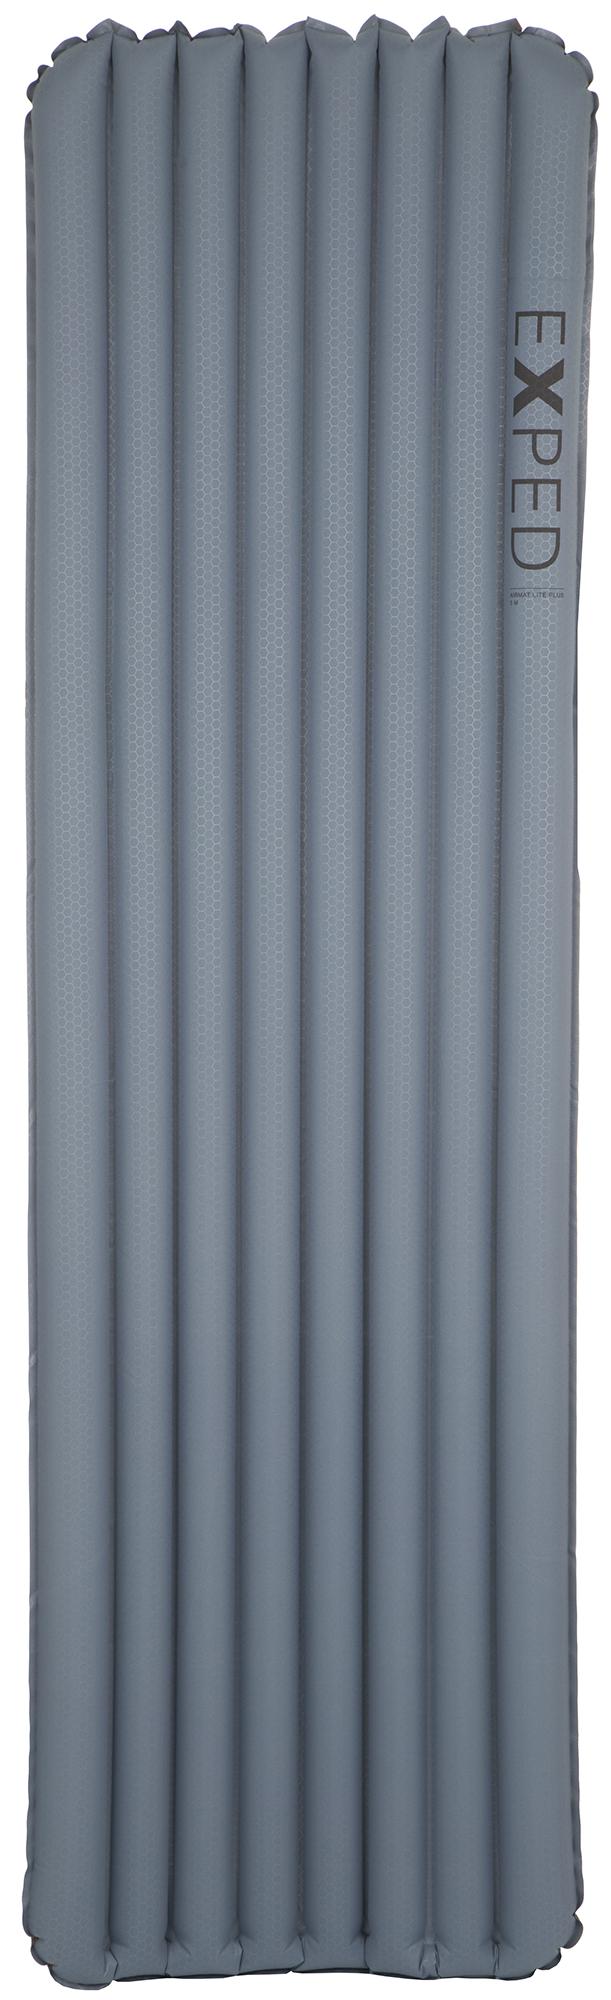 коврик norfin коврик самонадувающийся atlantic comfort nf 5 0см Exped Коврик самонадувающийся Exped AirMat Lite Plus 5 M, 183 см